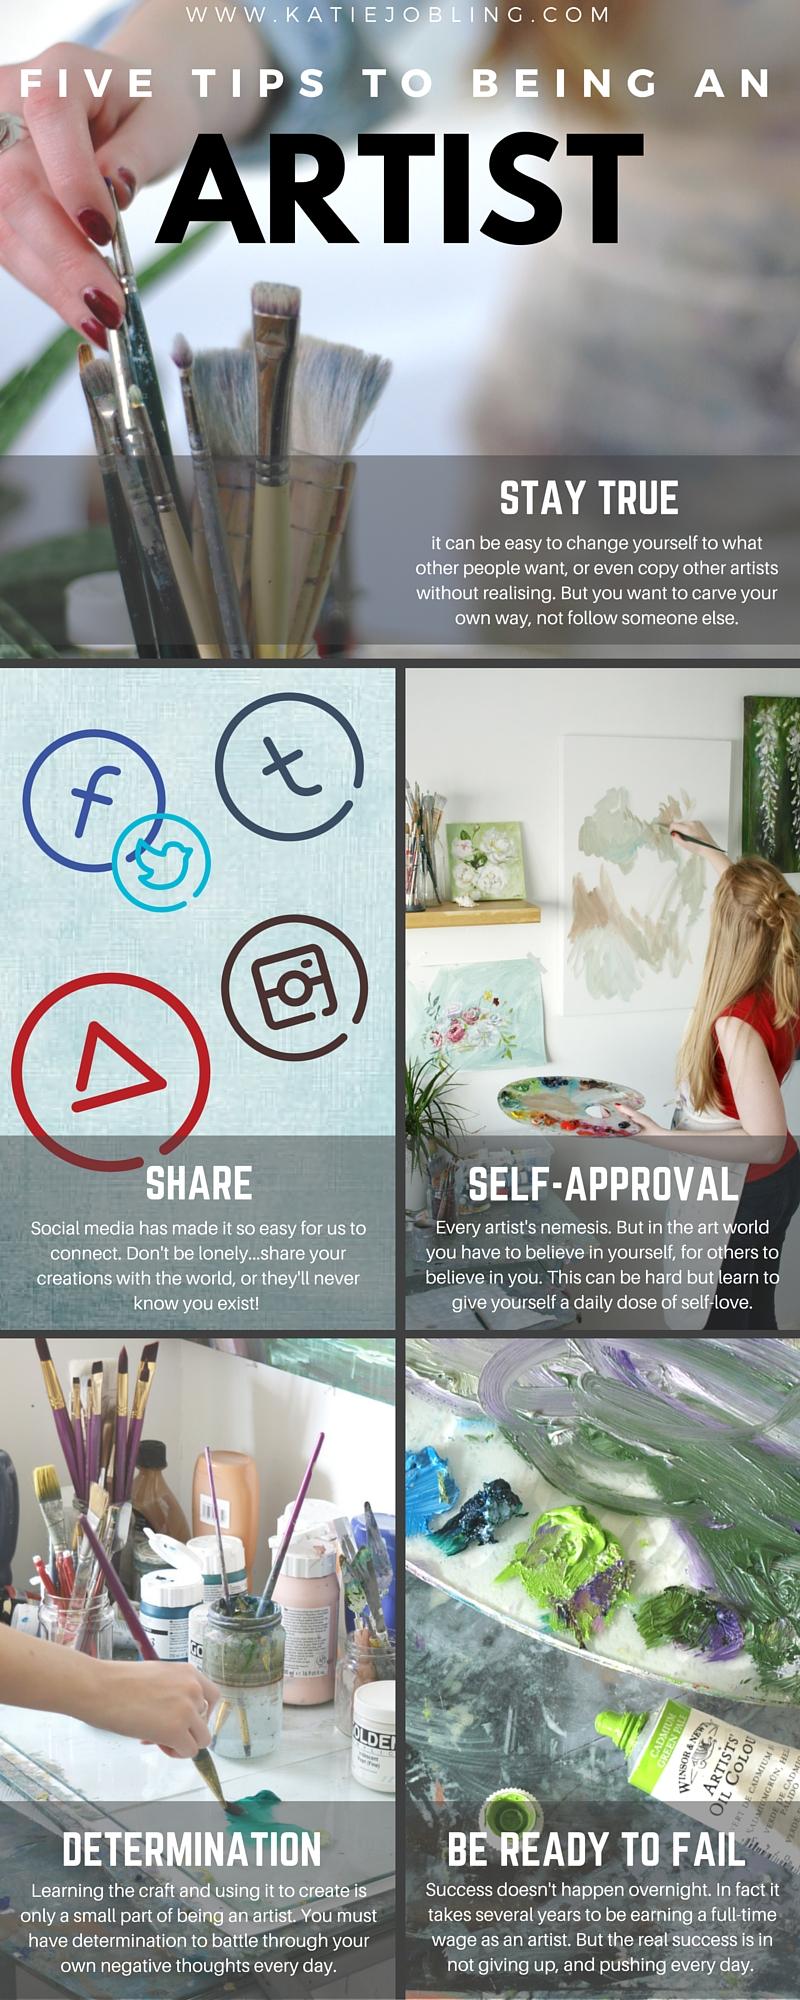 five tips artist